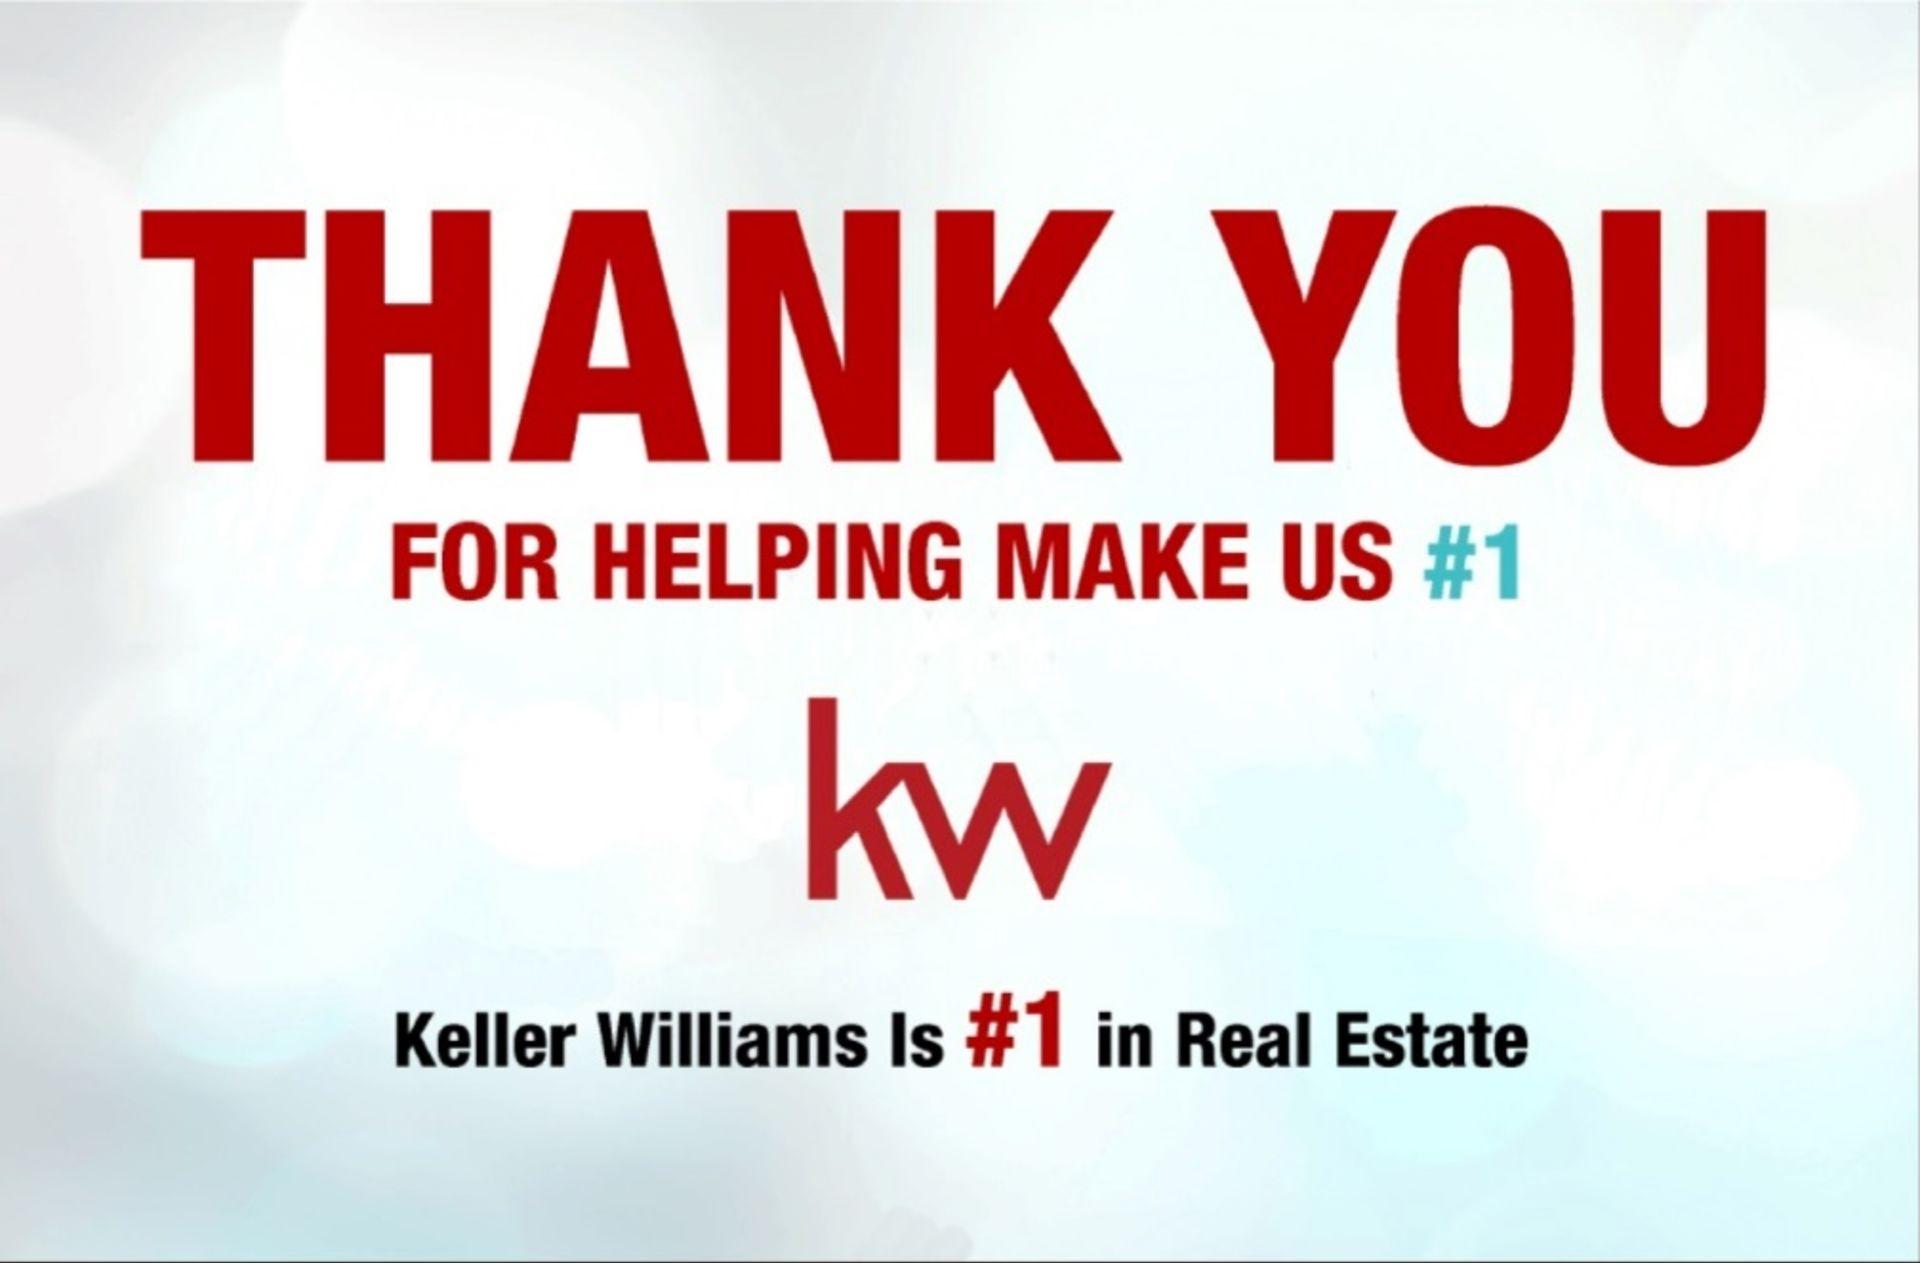 Keller Williams is #1 Real Estate Franchise in U.S.